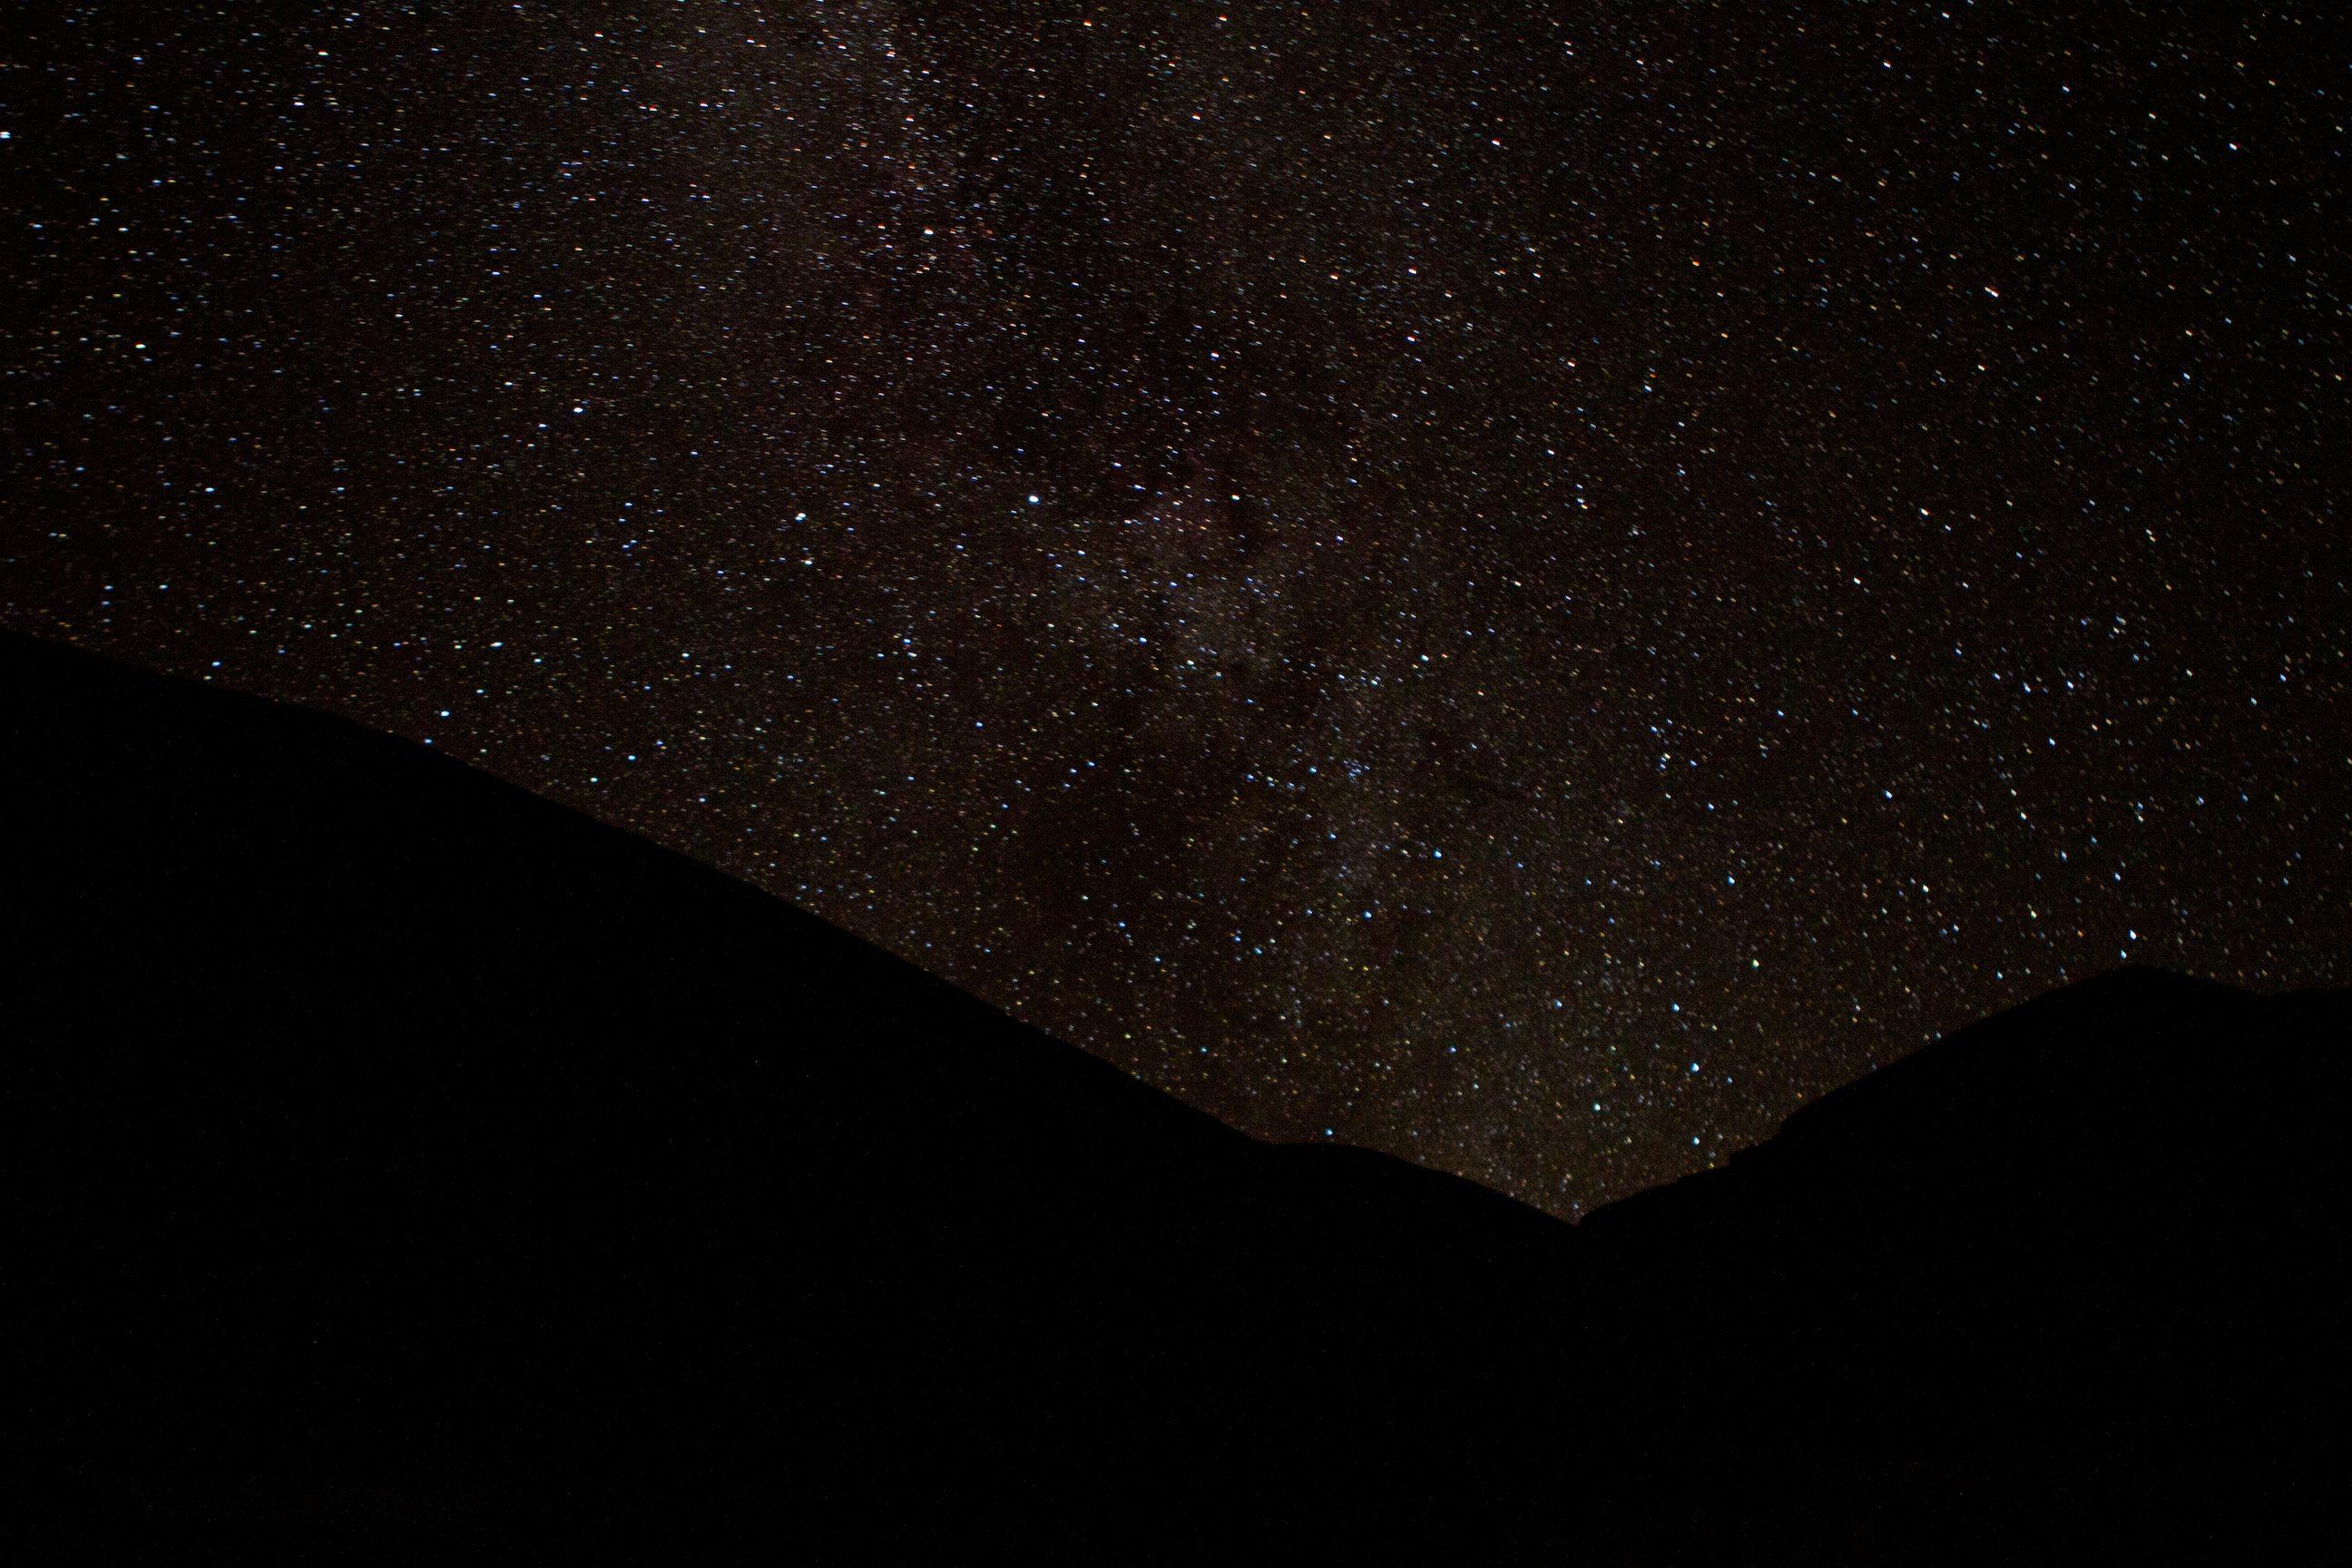 2012-07-20-STARS2.jpg